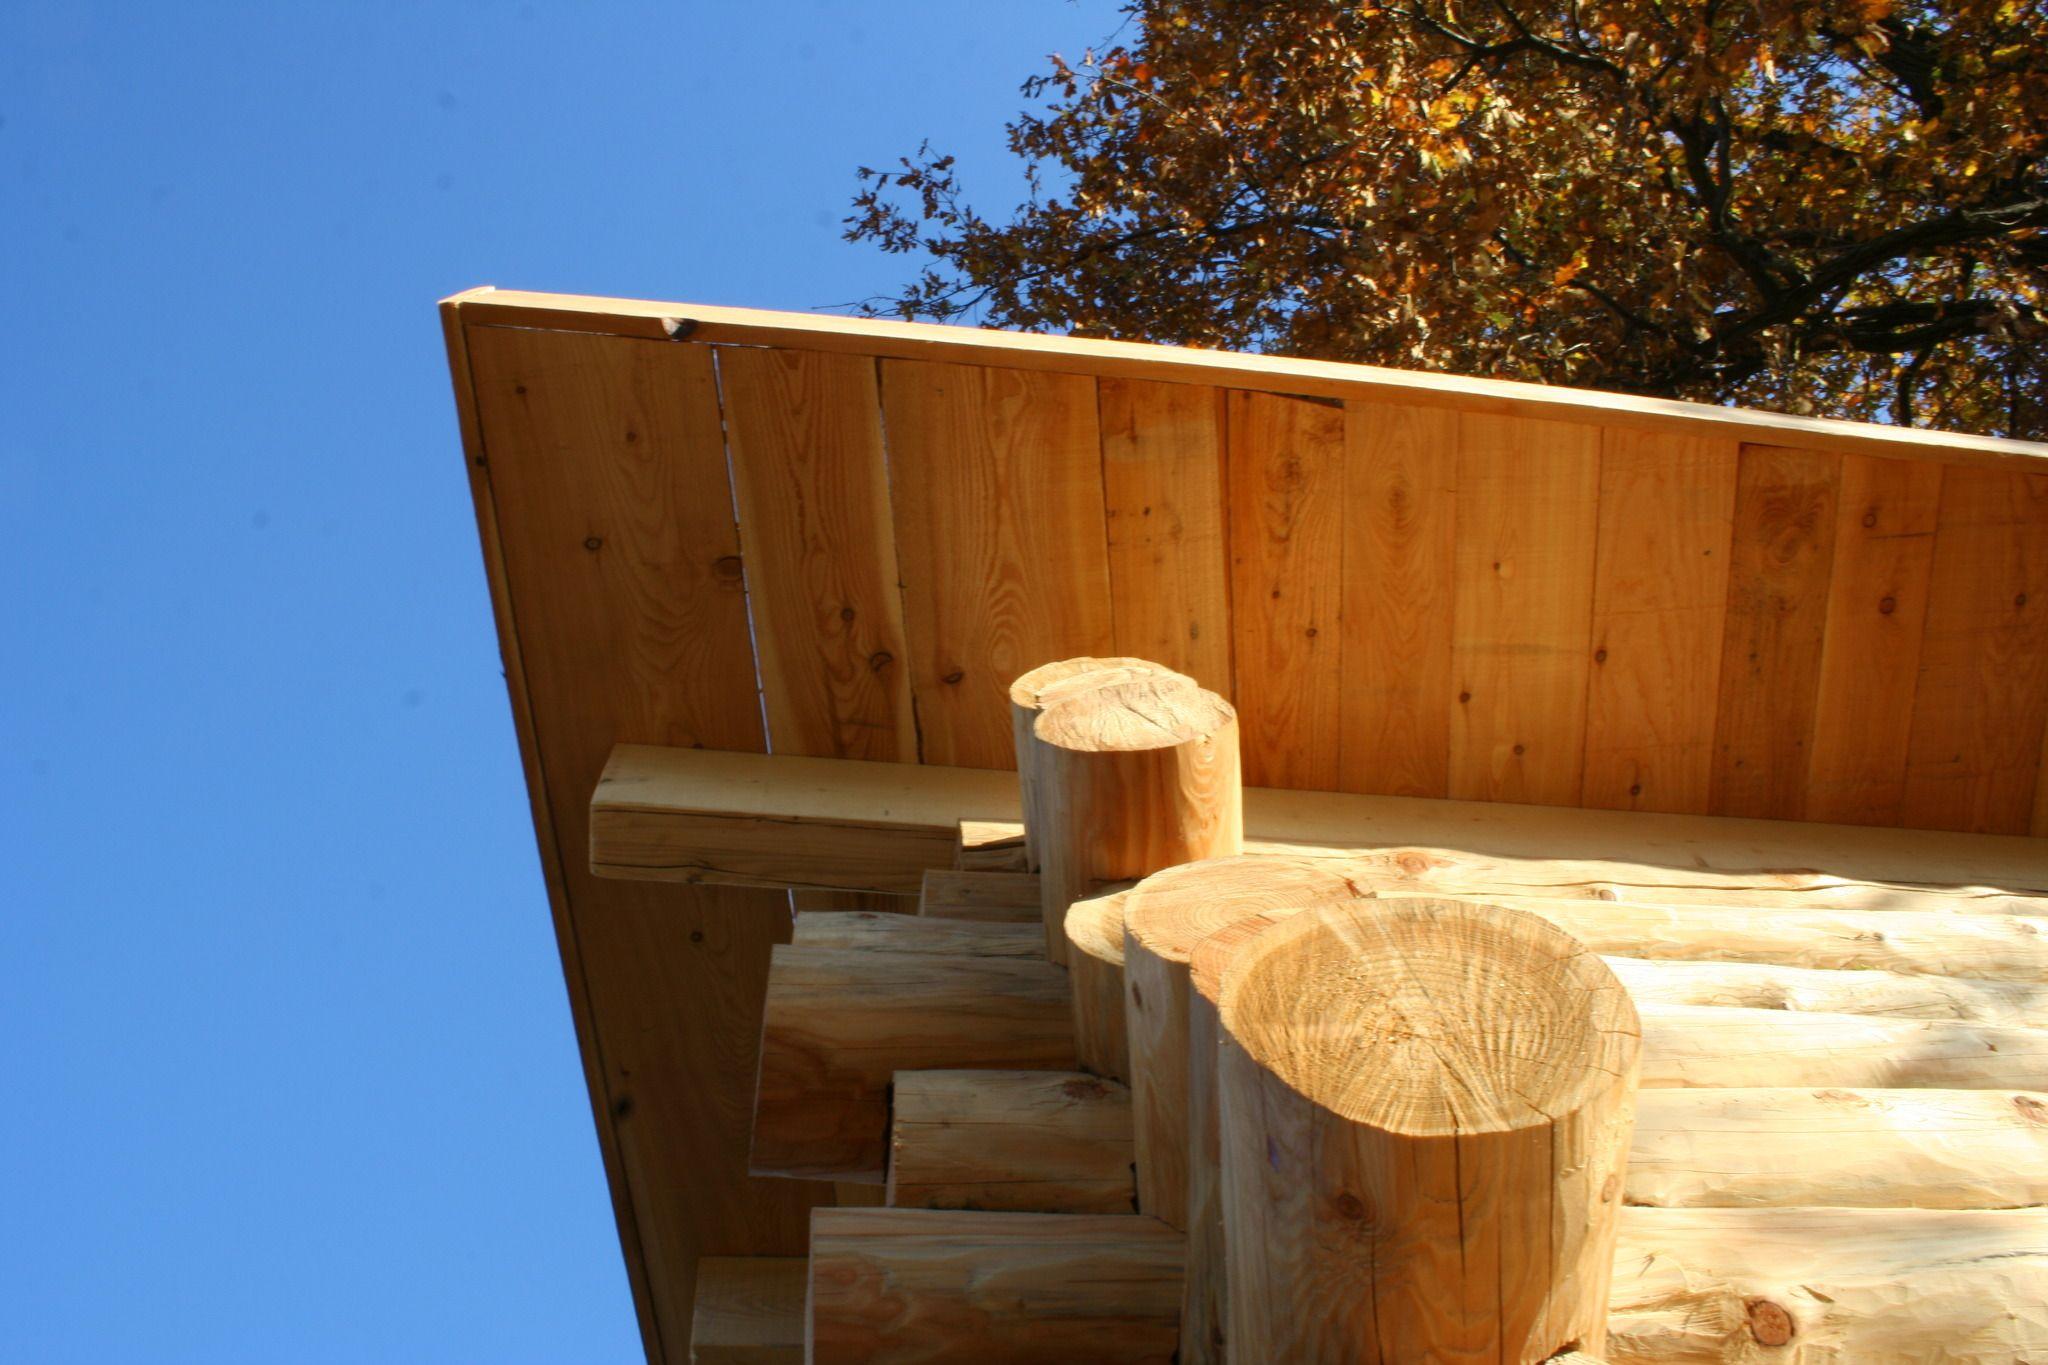 sauna in tronchi LOG SAUNA - Wworks